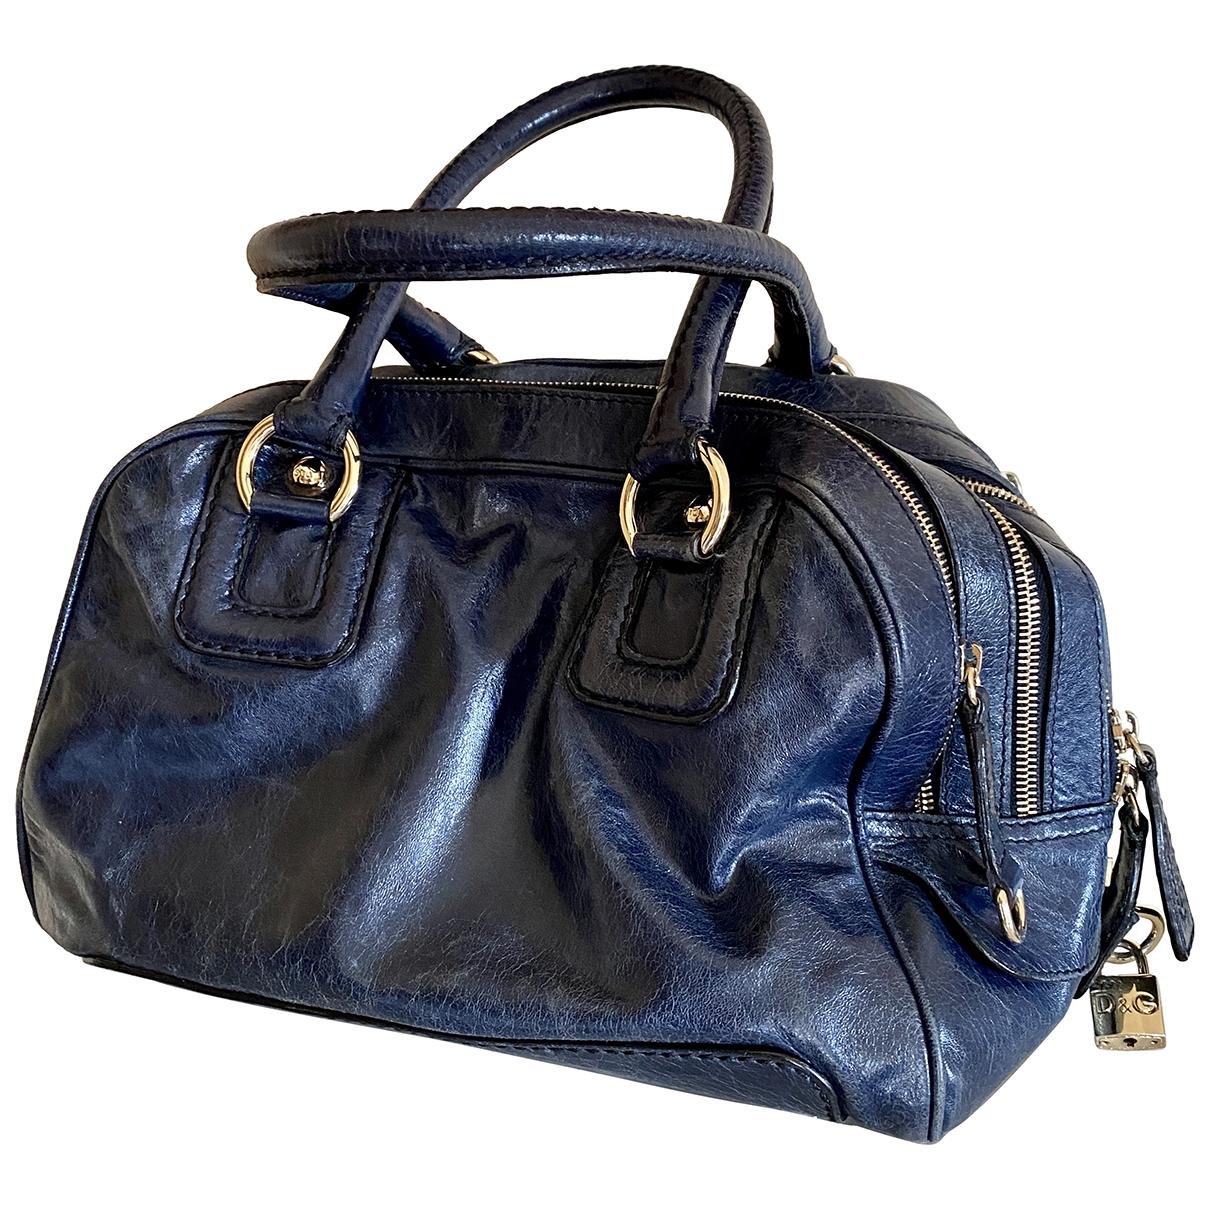 D&g \N Handtasche in  Blau Leder